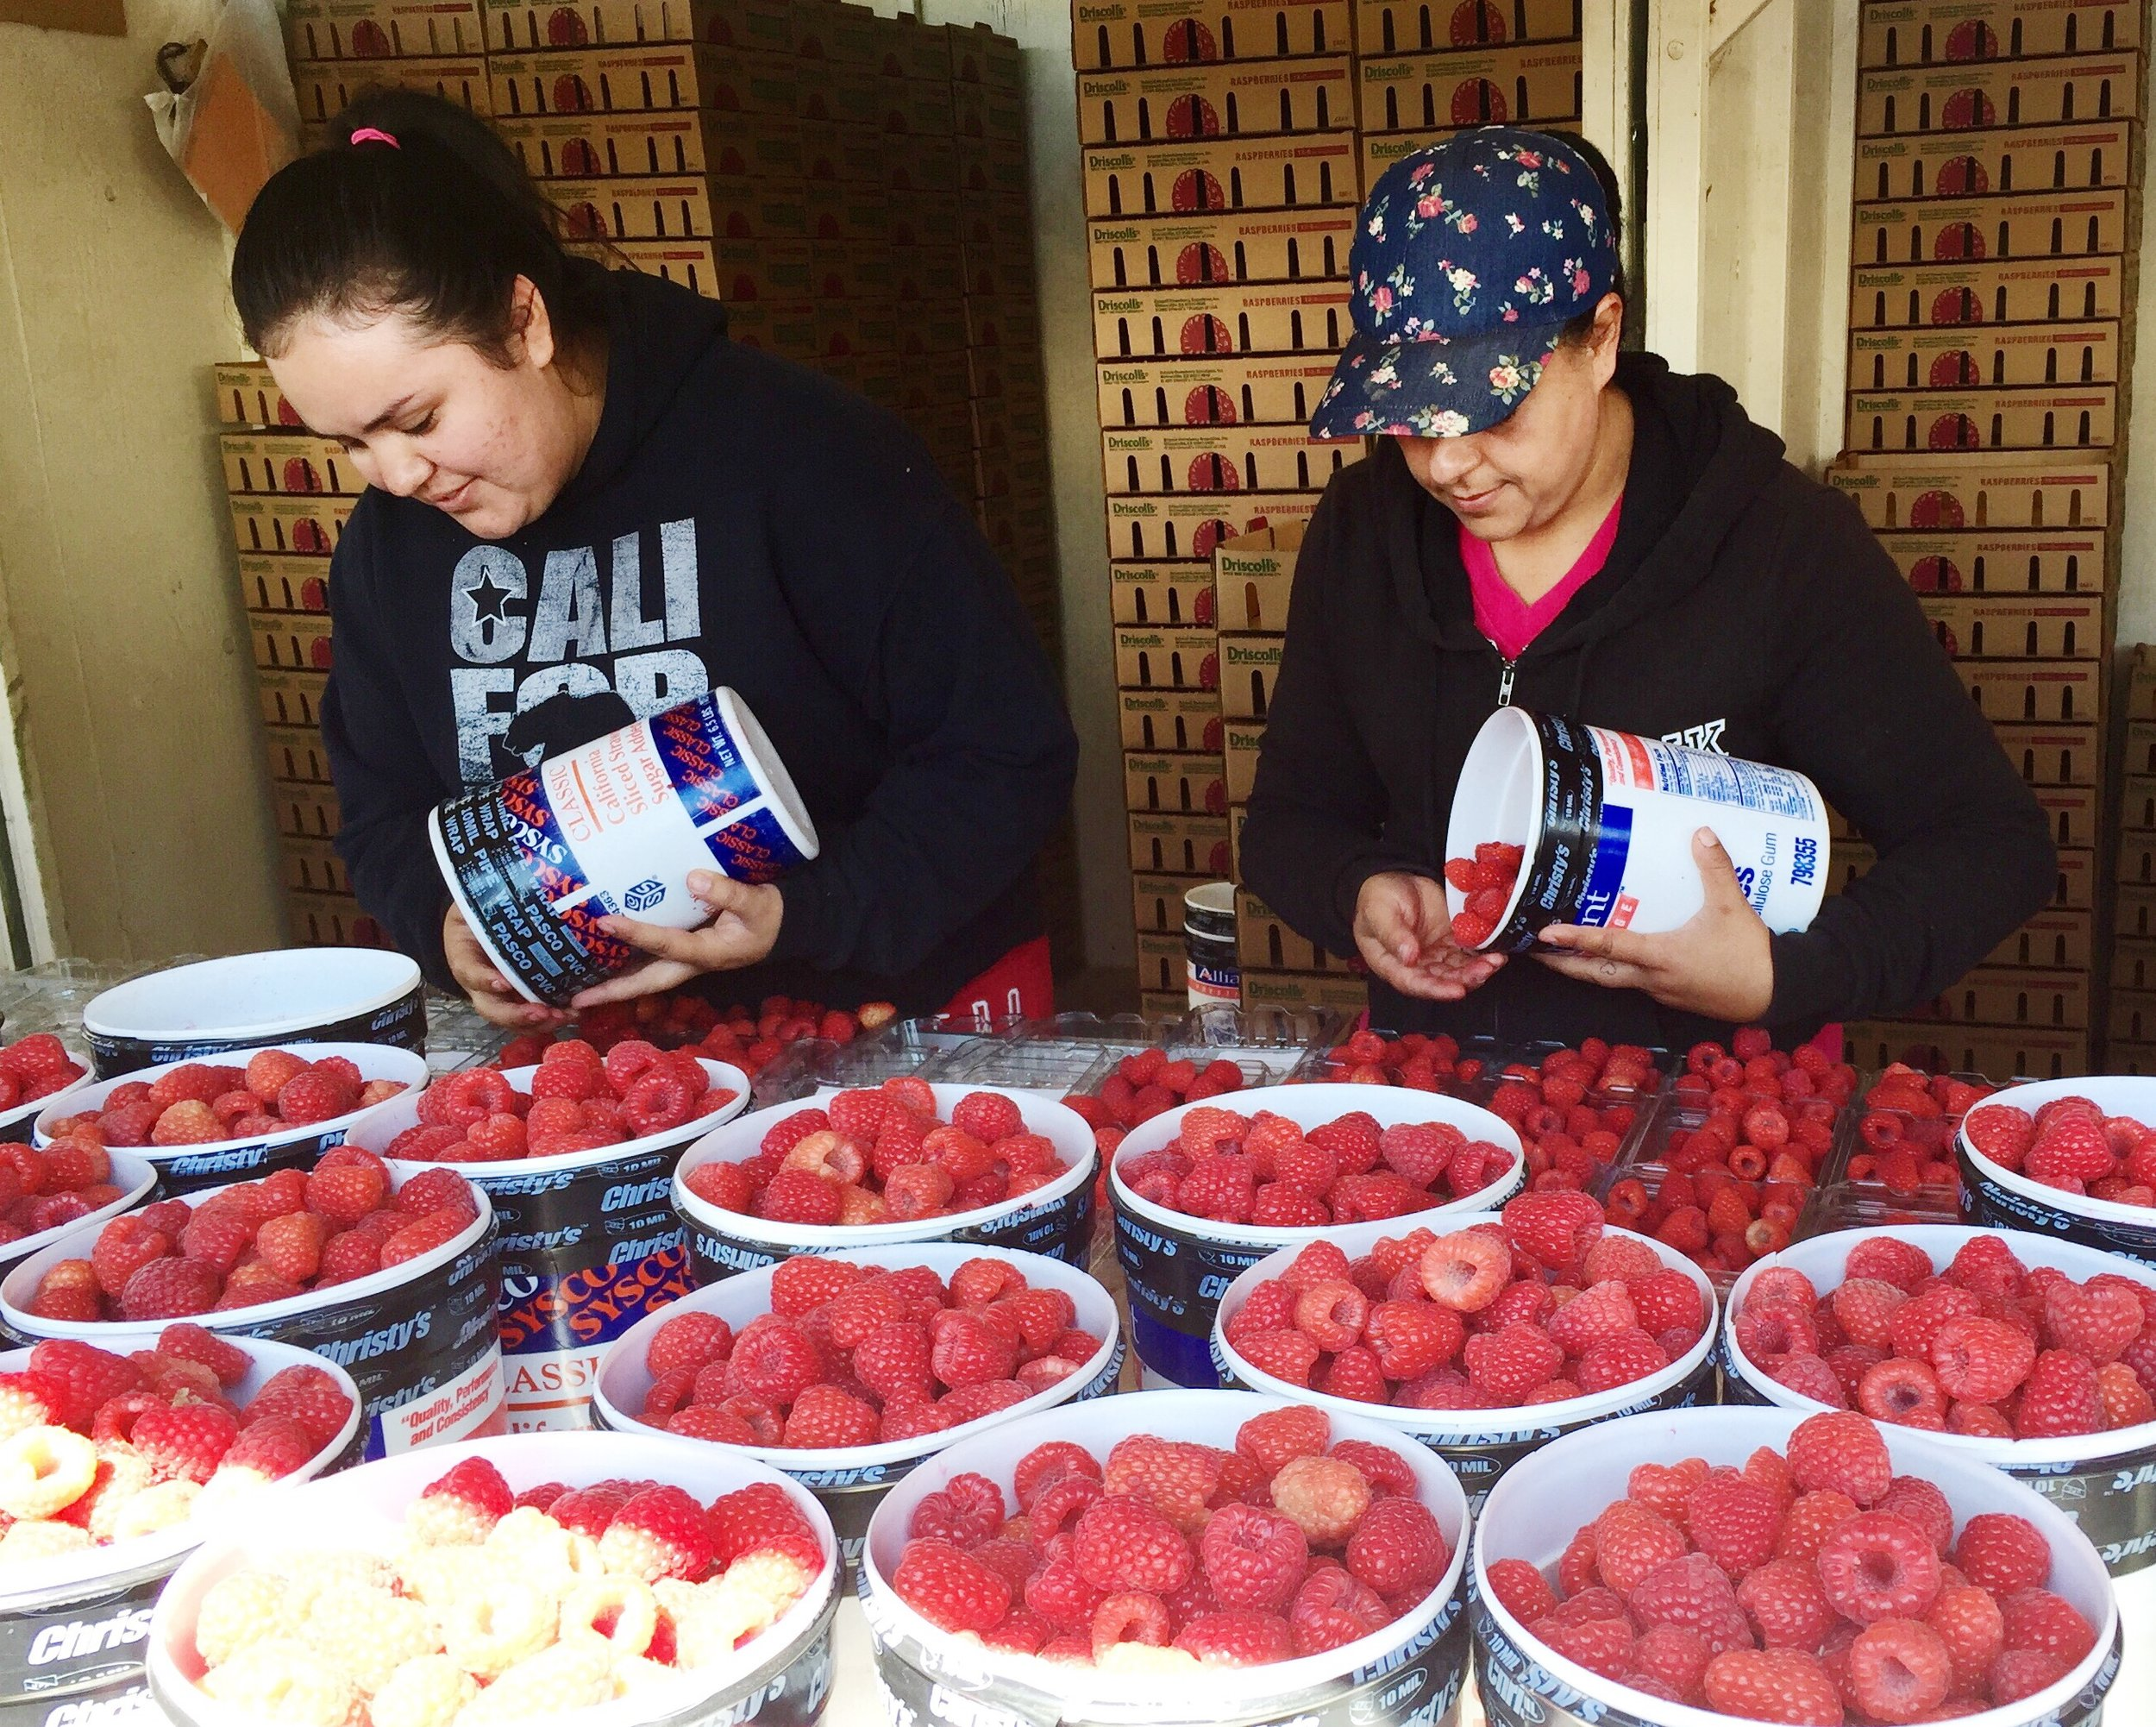 Gathering raspberries.